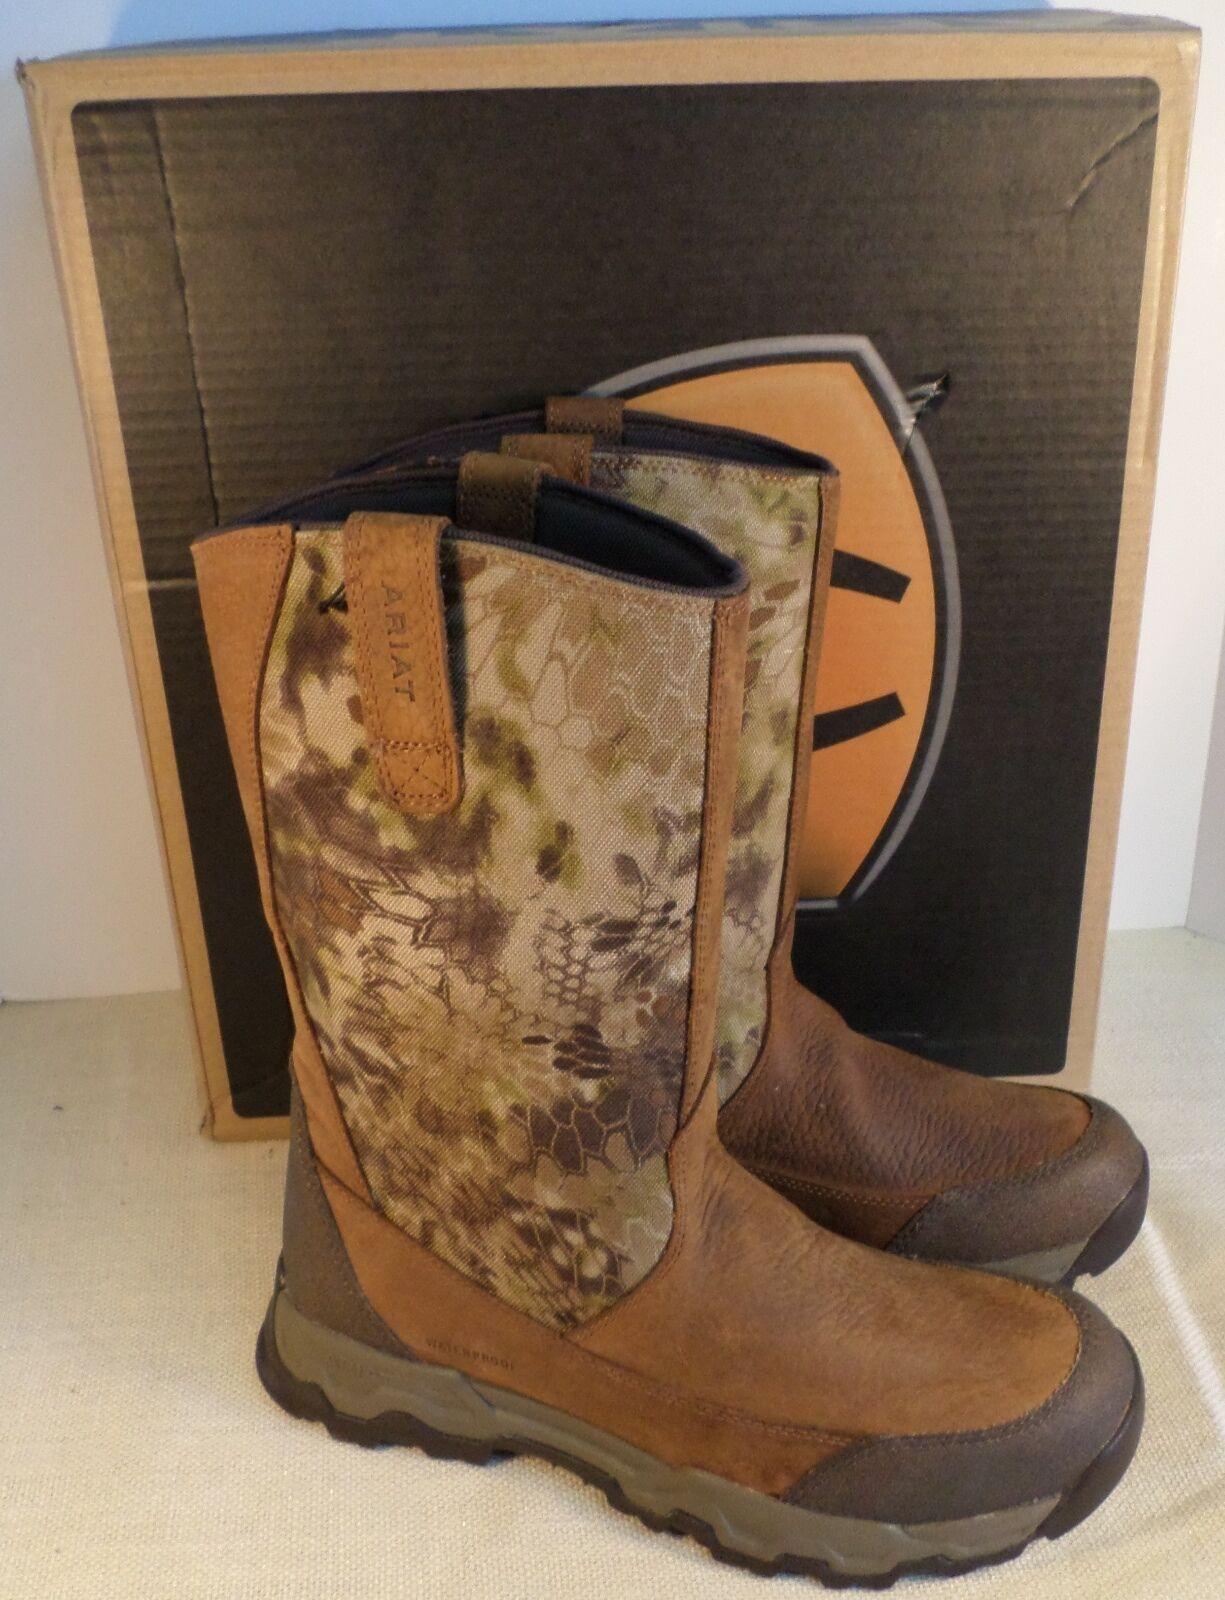 Ariat 10014192 UOMO  Fps da Infilare H2o pelle Marronee Highlander Stivali  senza esitazione! acquista ora!